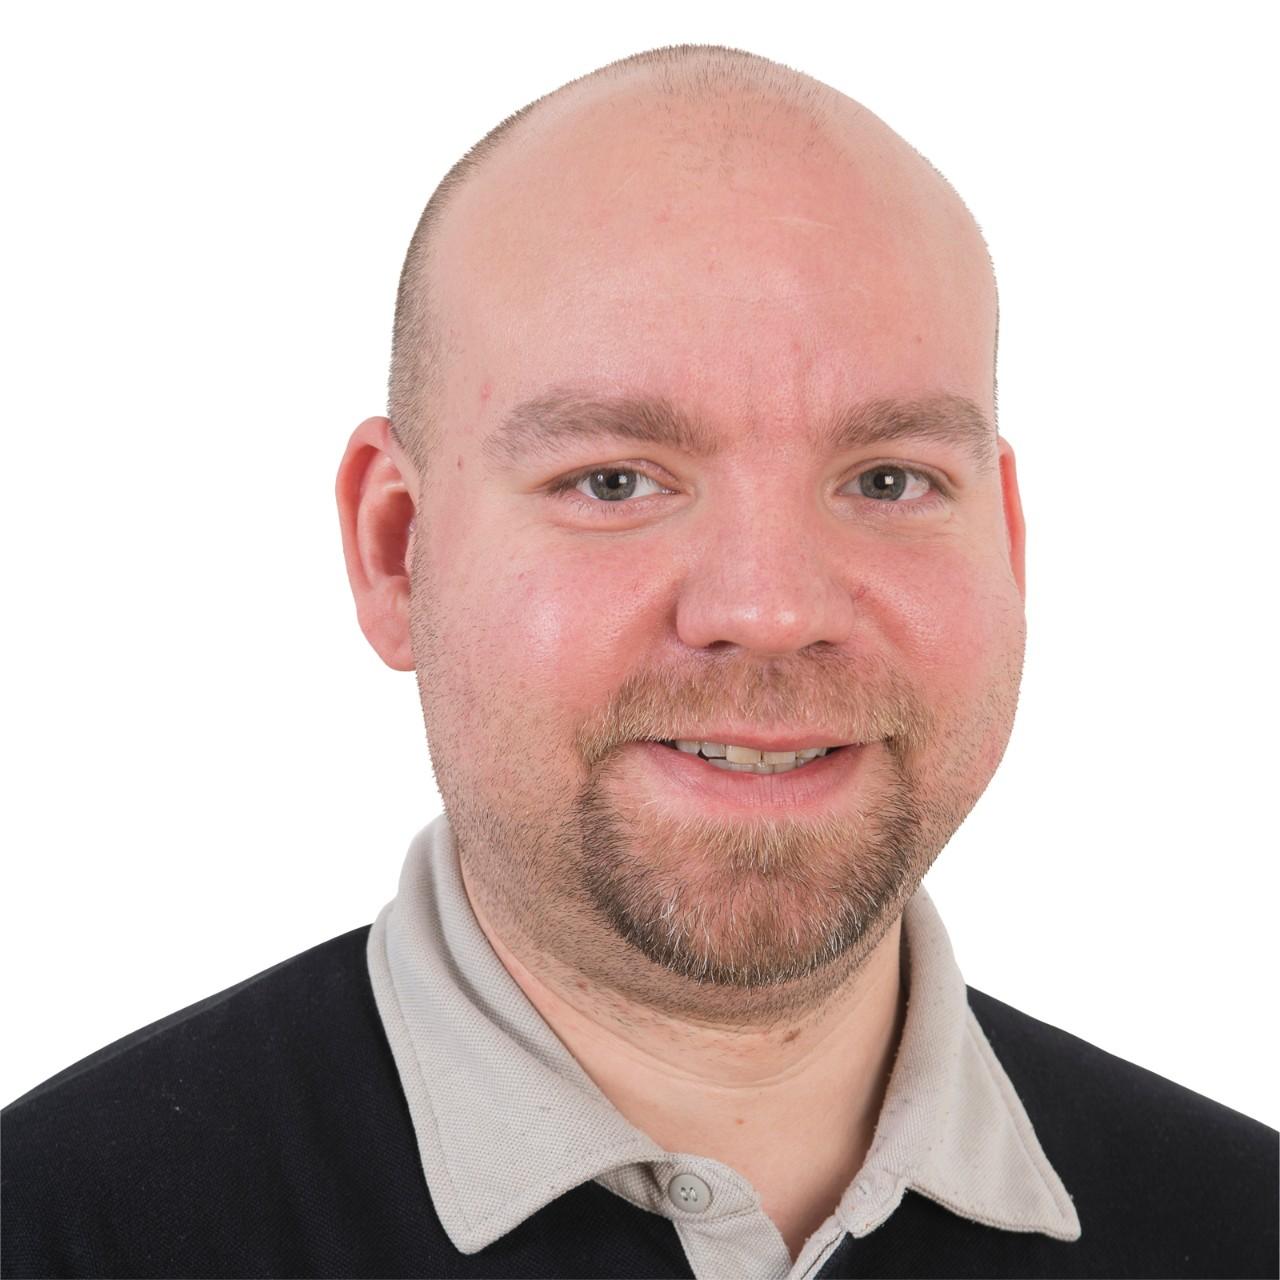 Johan Byberg